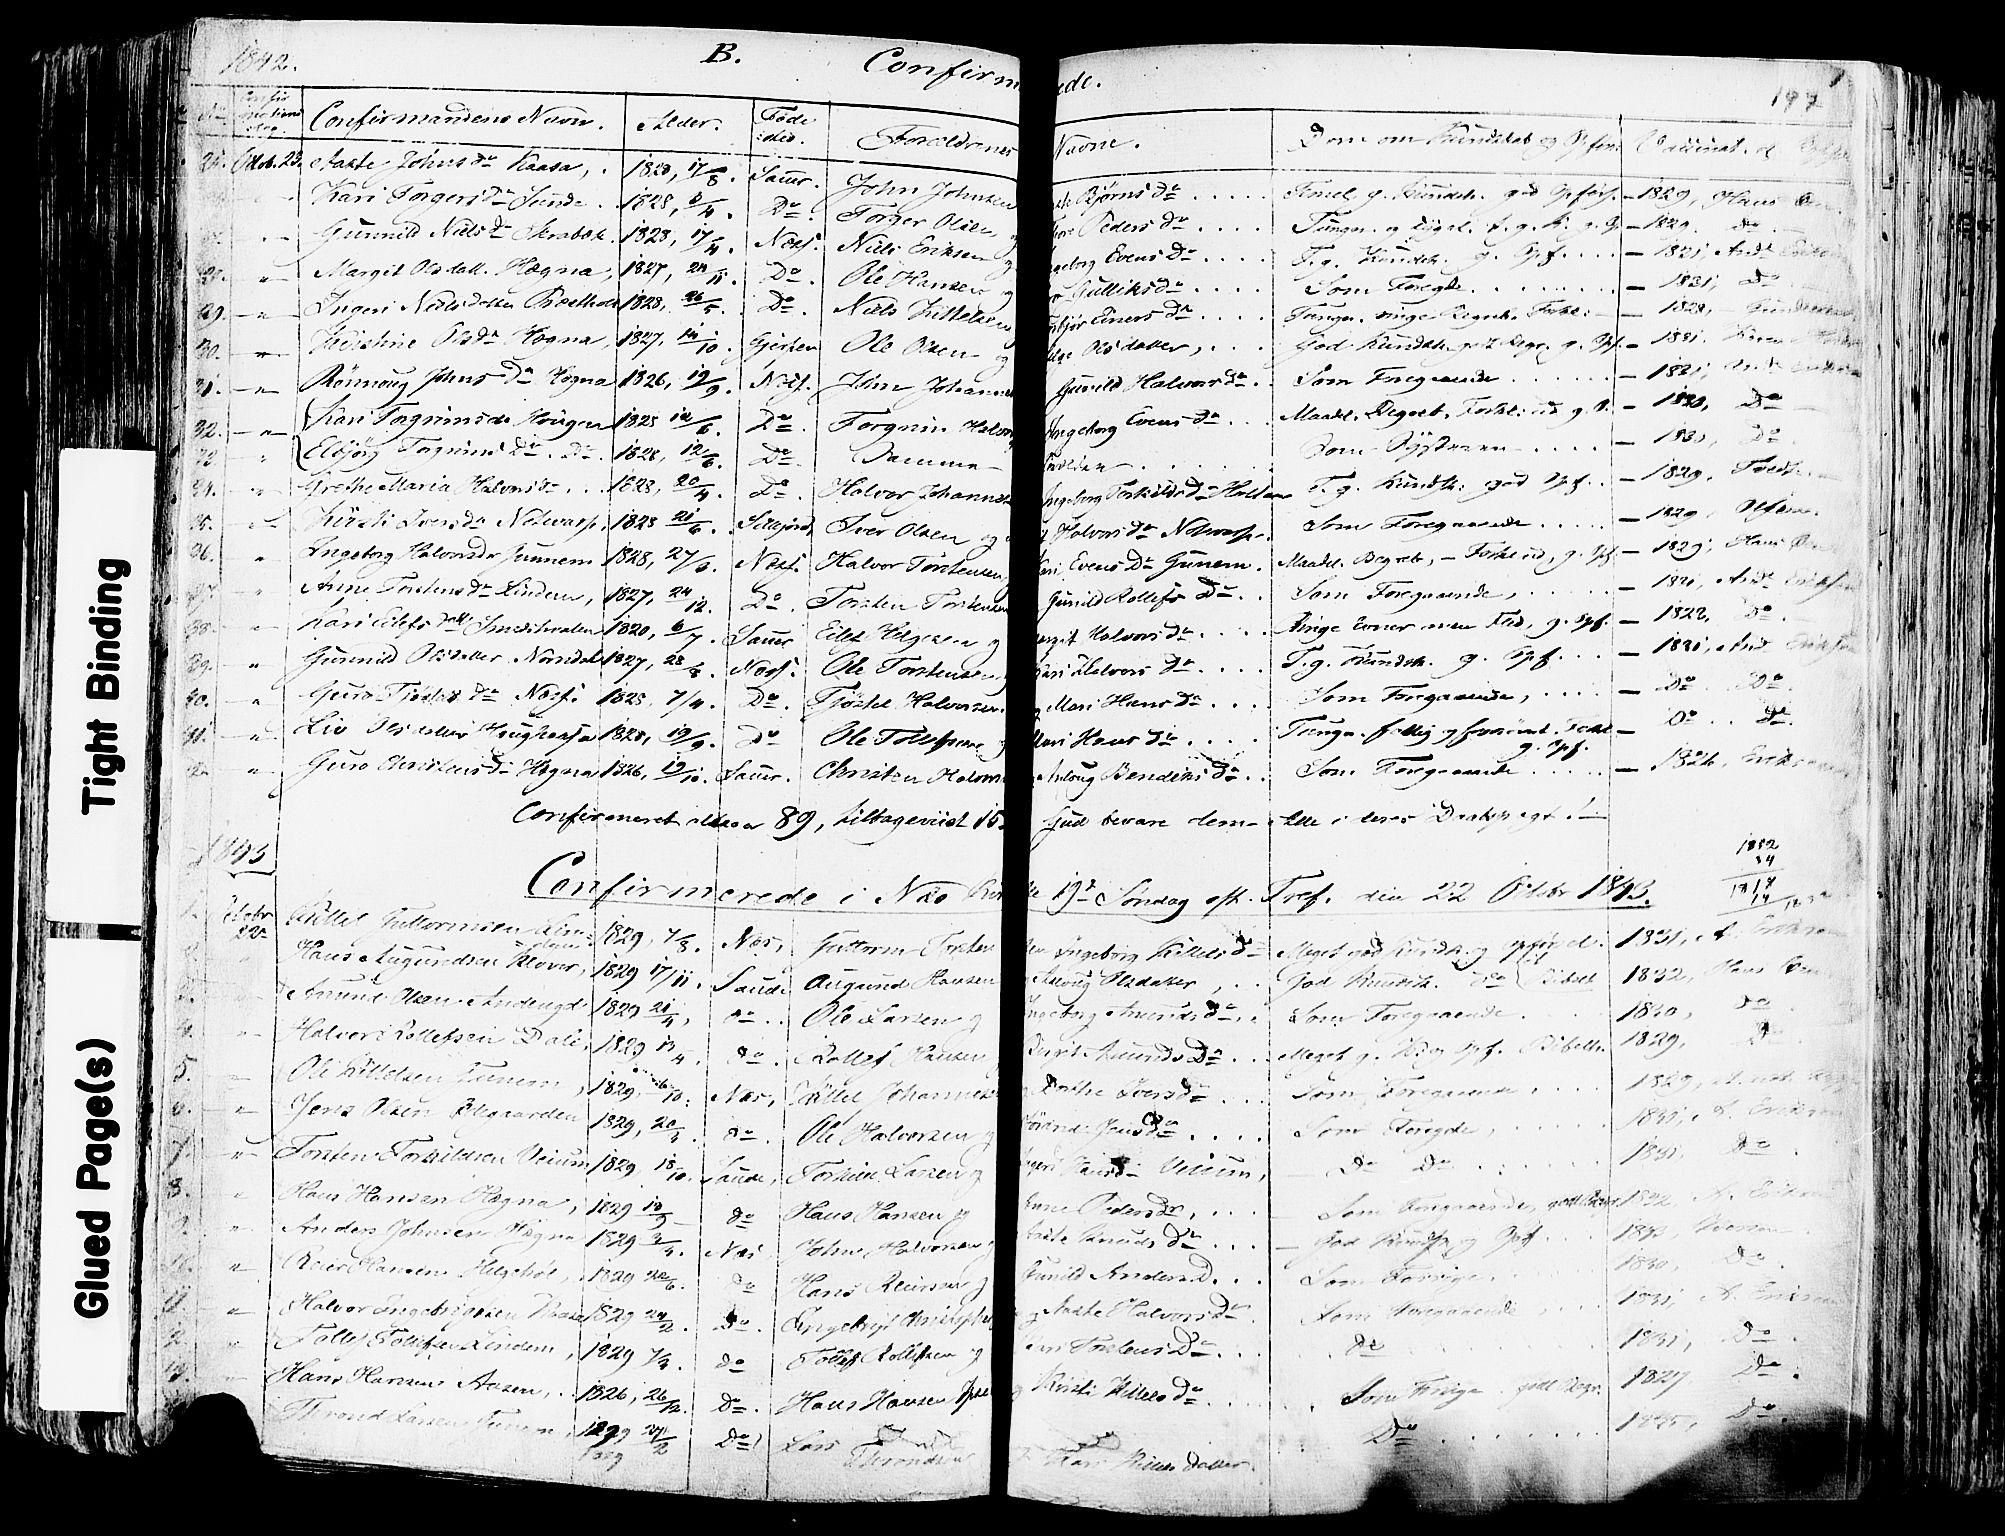 SAKO, Sauherad kirkebøker, F/Fa/L0006: Ministerialbok nr. I 6, 1827-1850, s. 197